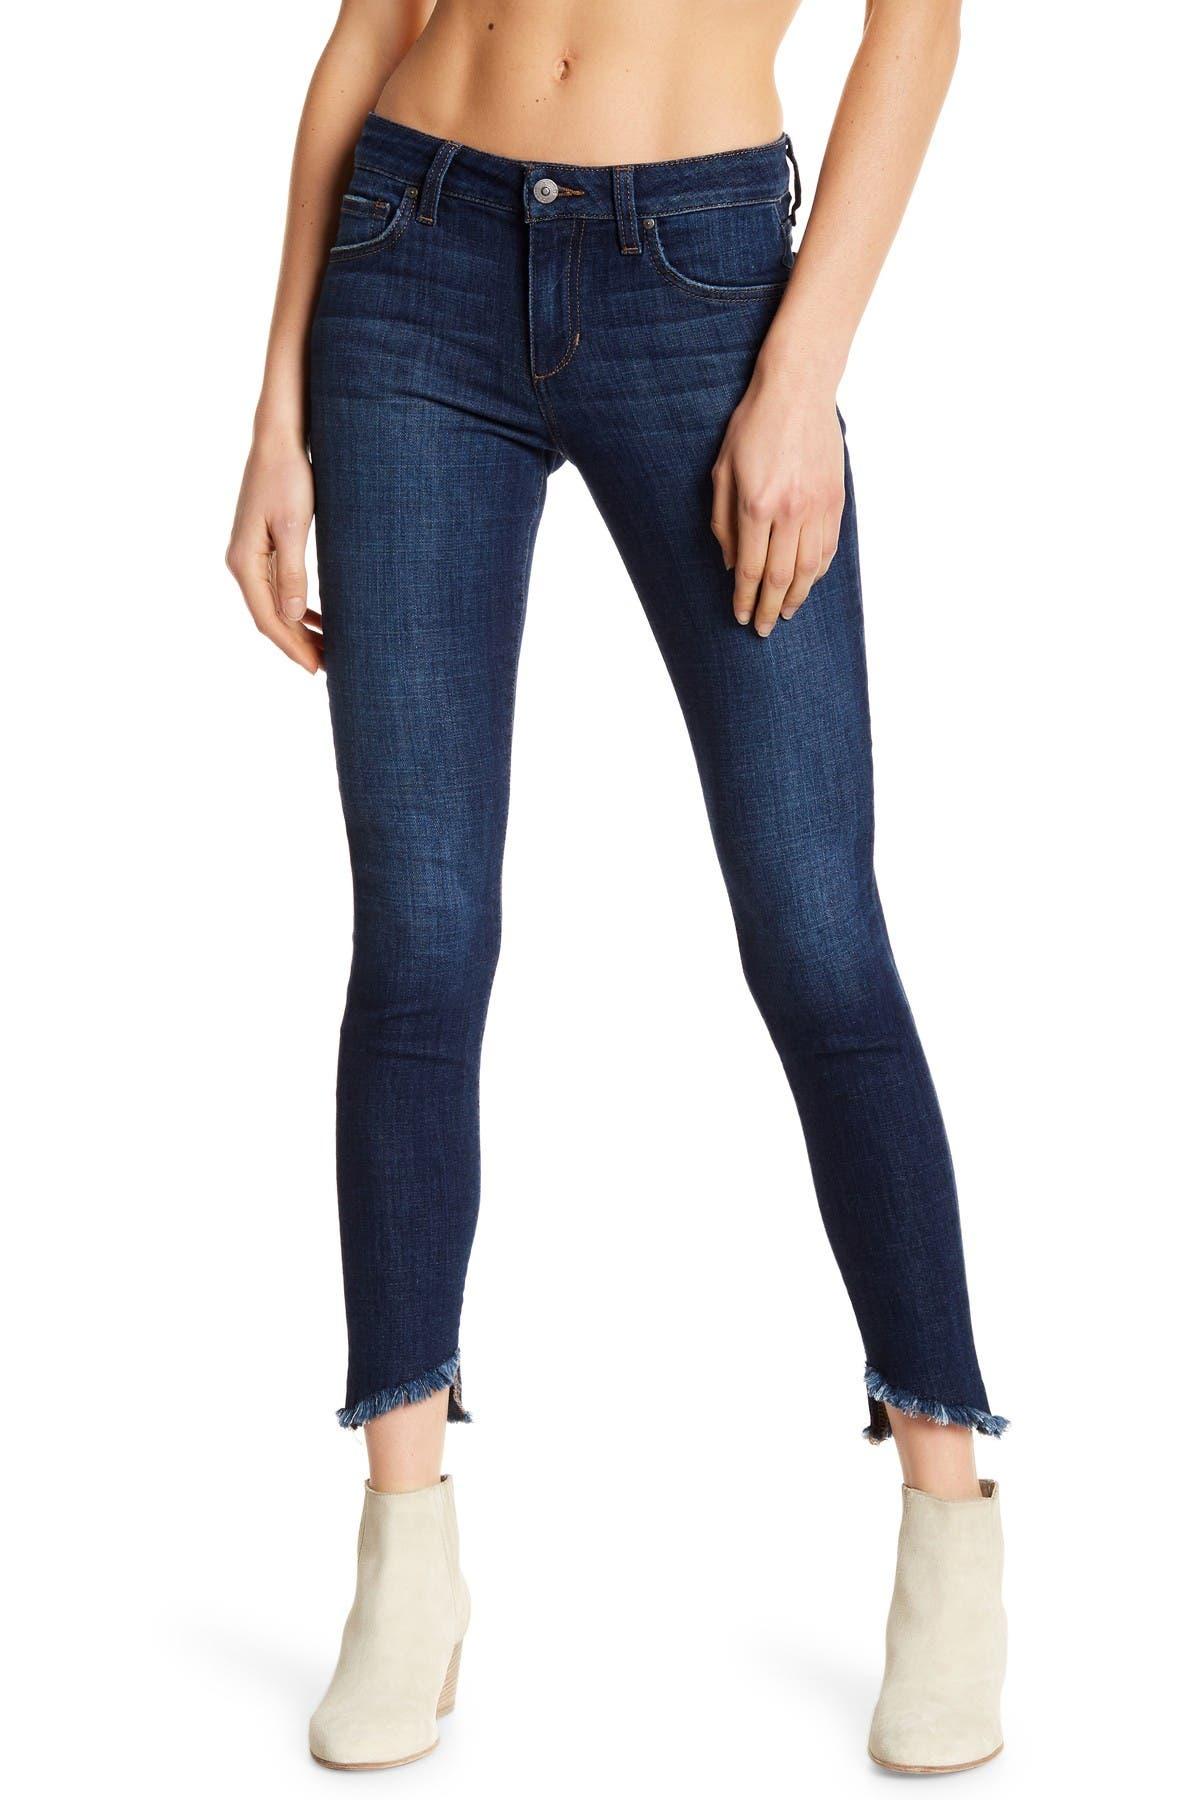 Image of Joe's Jeans Blondie Frayed Slant Hem Jeans